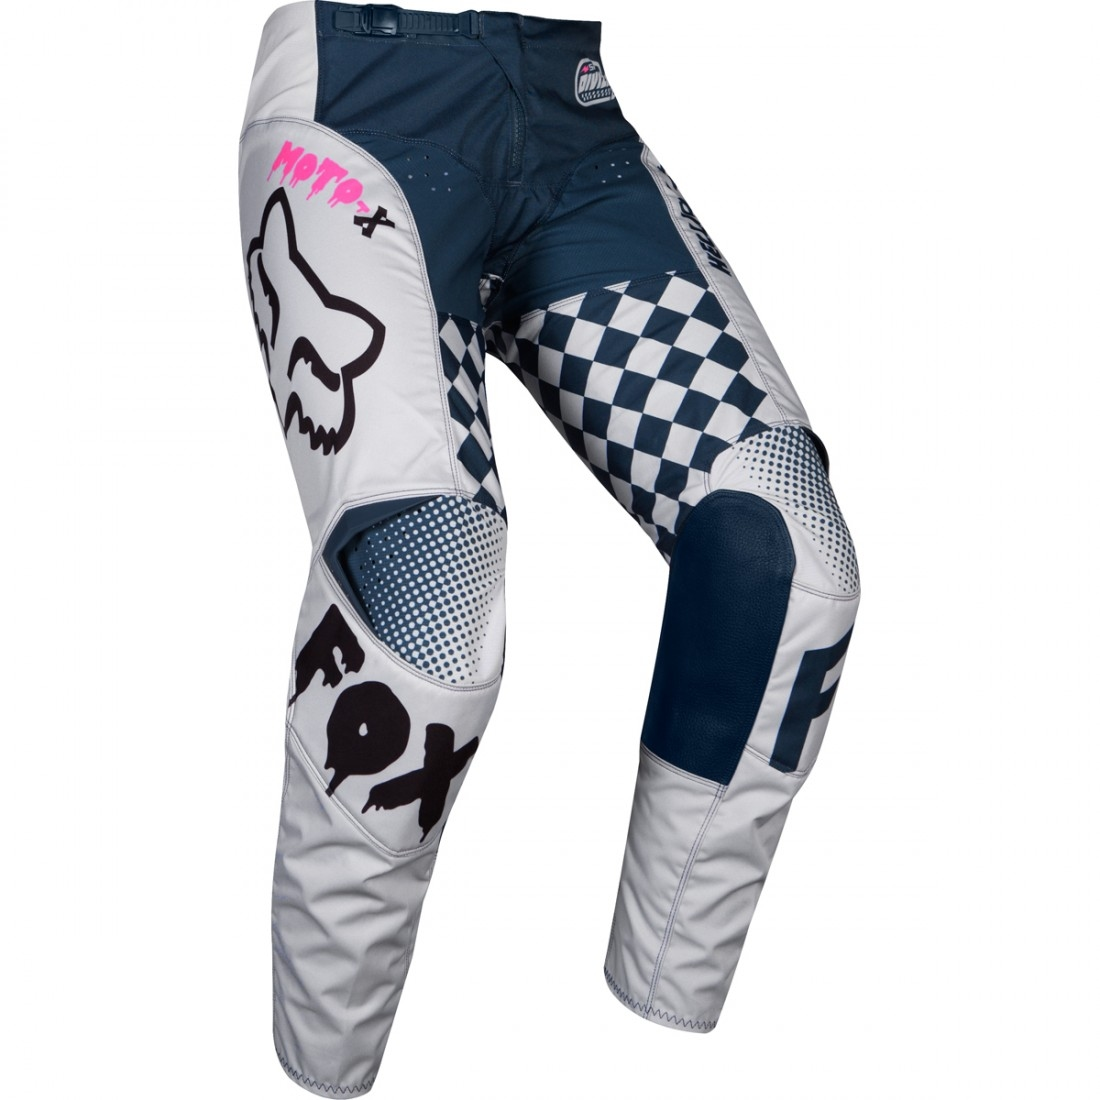 6c249f29f FOX 180 2019 Junior Czar Light Grey Pant · Motocard